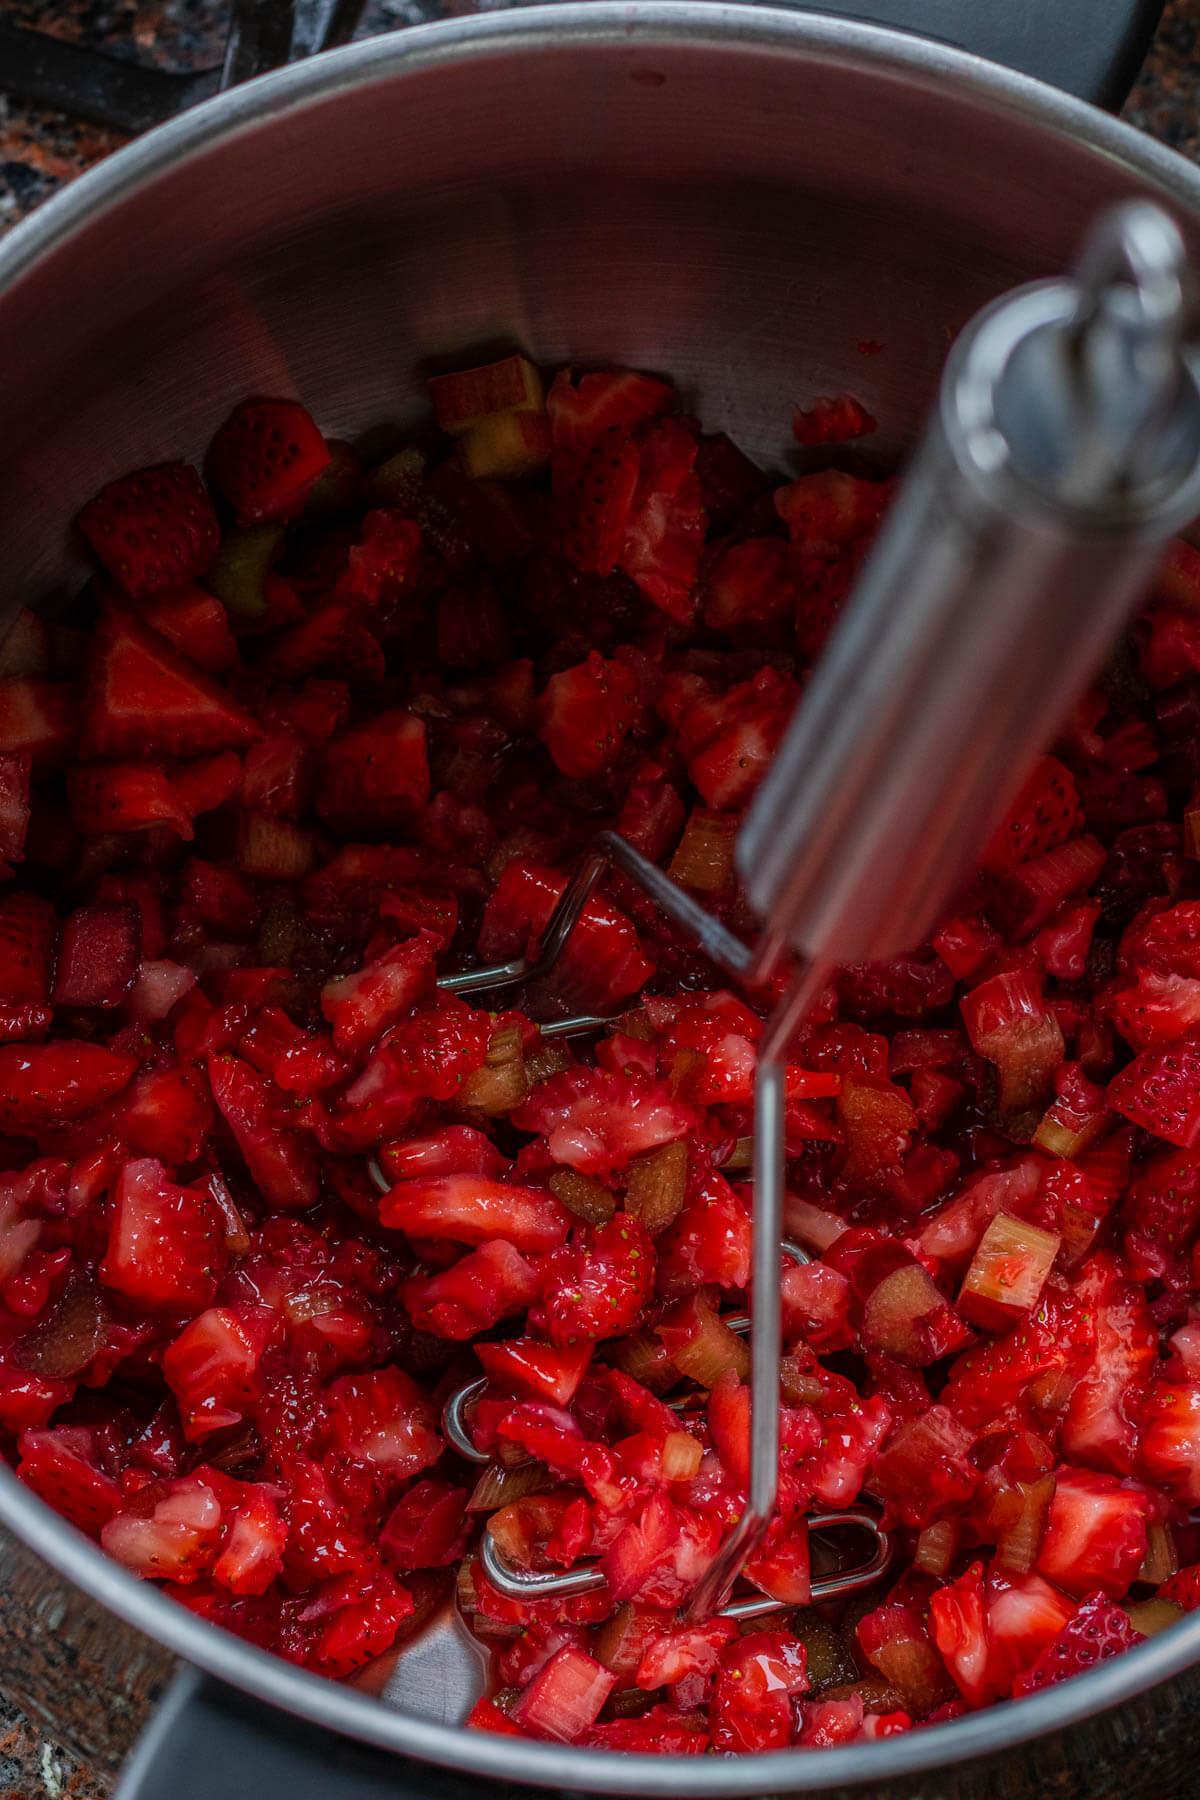 Mashing fresh strawberries with a potato masher in a saucepan.